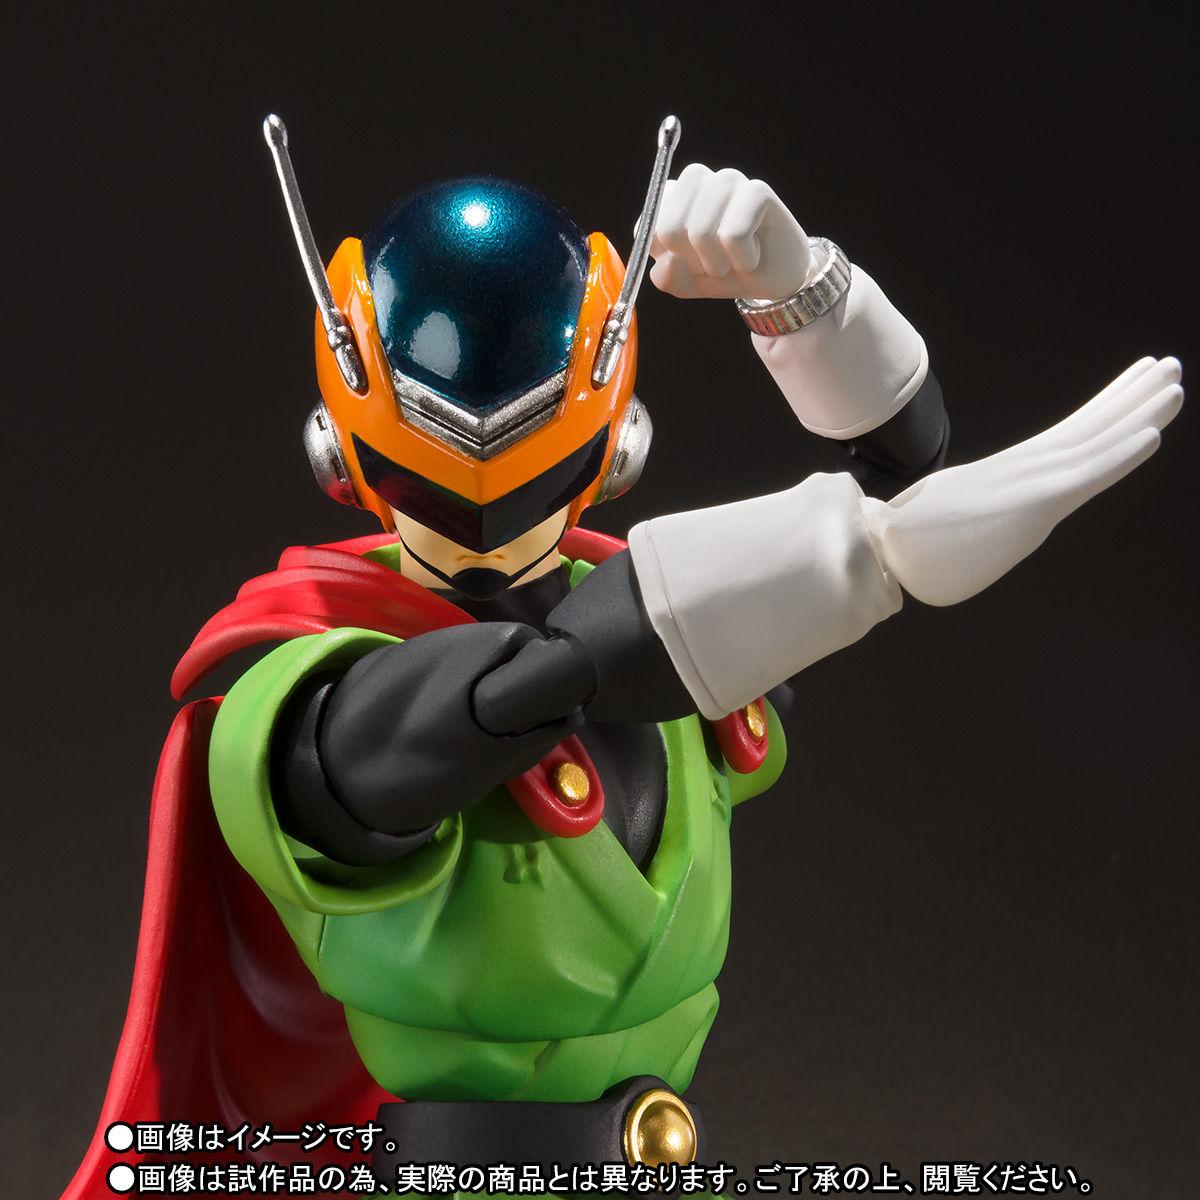 S.H.フィギュアーツ『グレートサイヤマン』ドラゴンボールZ 可動フィギュア-001